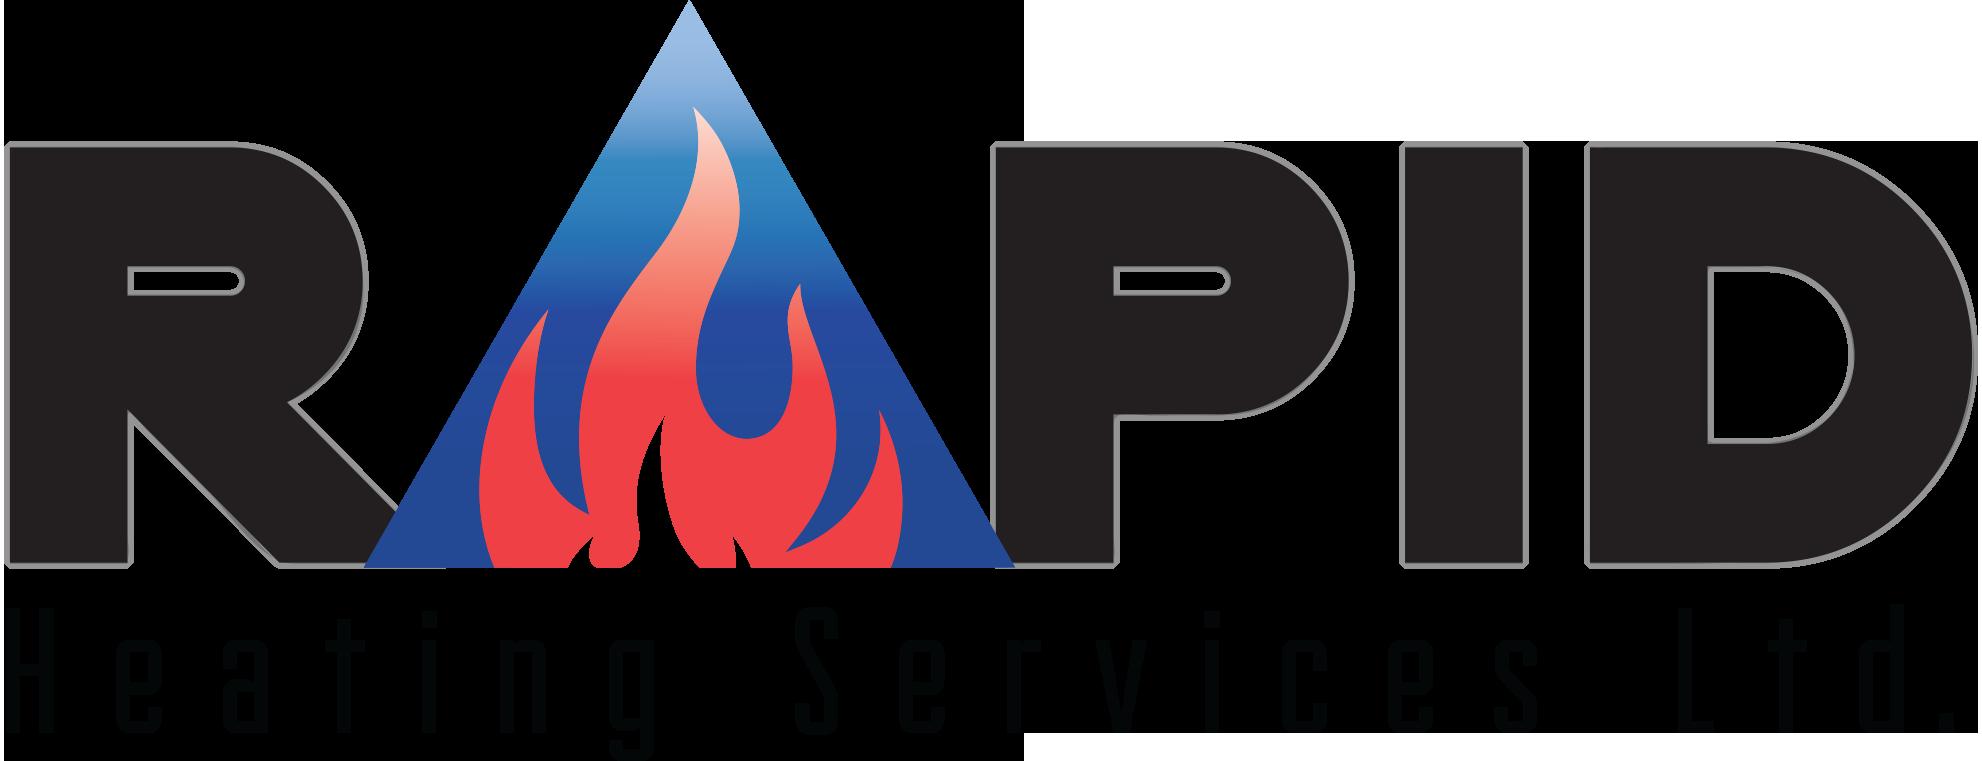 Rapid Heating Services Ltd.